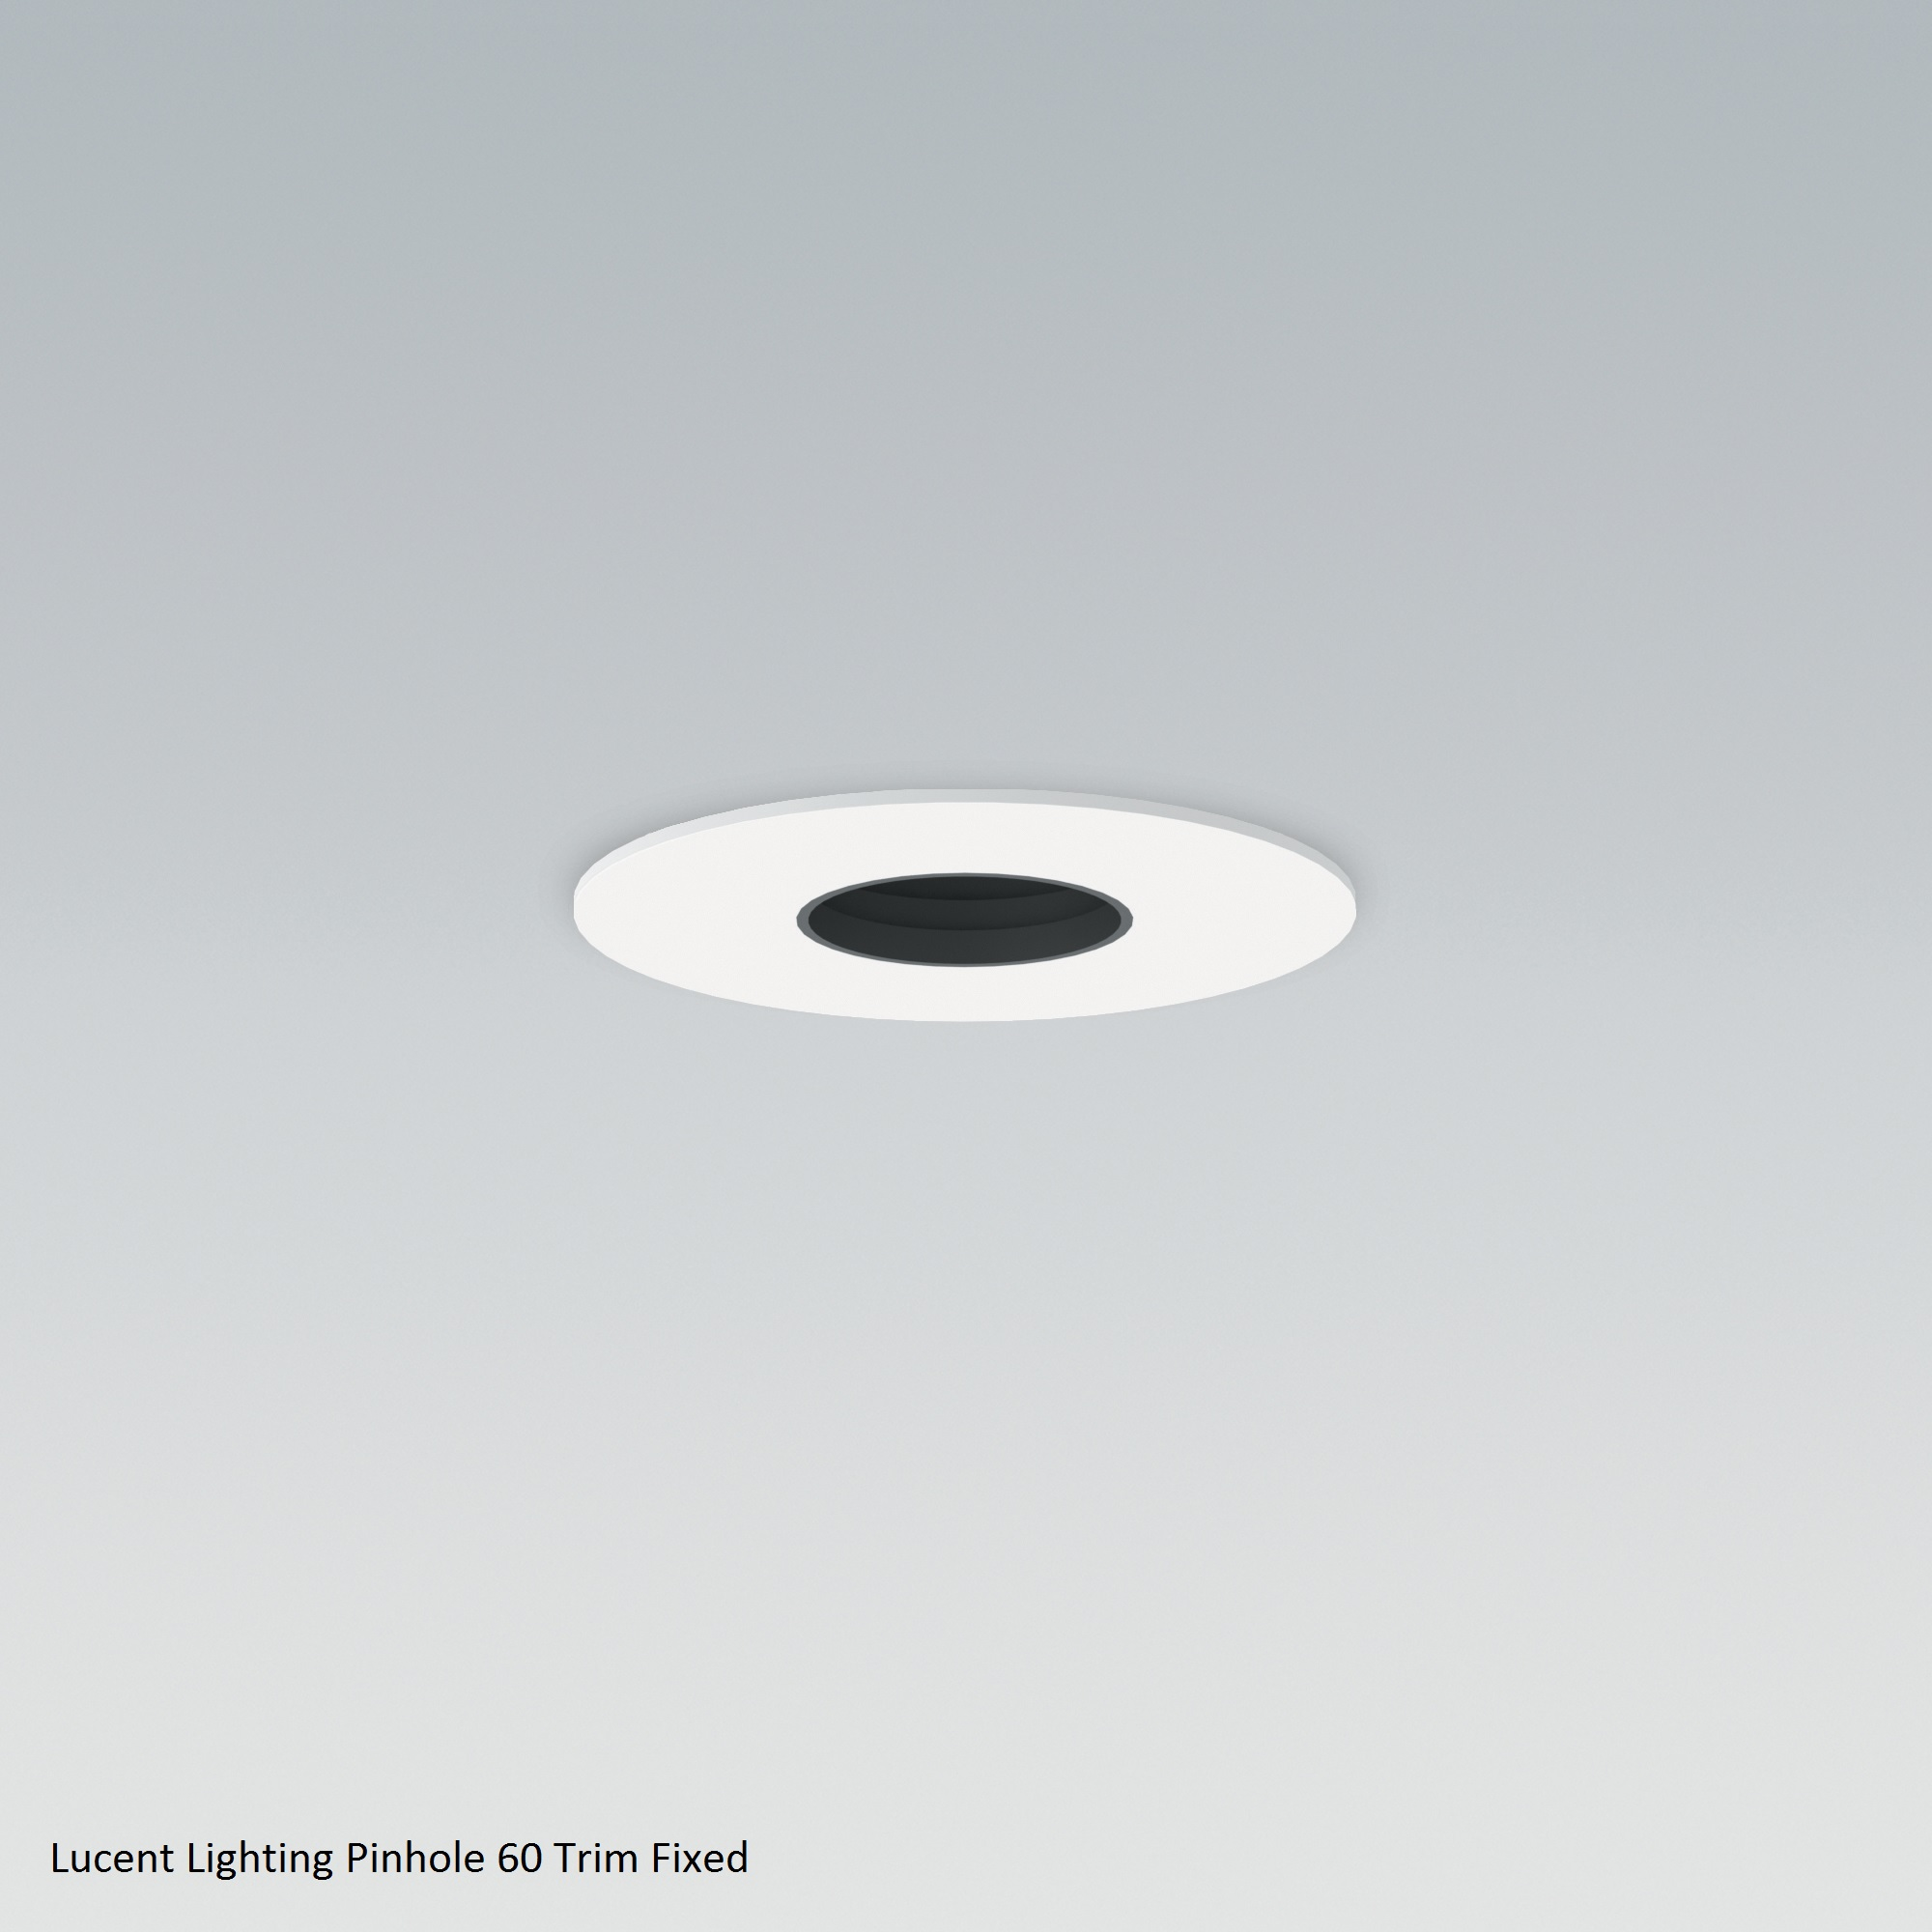 LucentLighting Pinhole 60 Trim Fixed